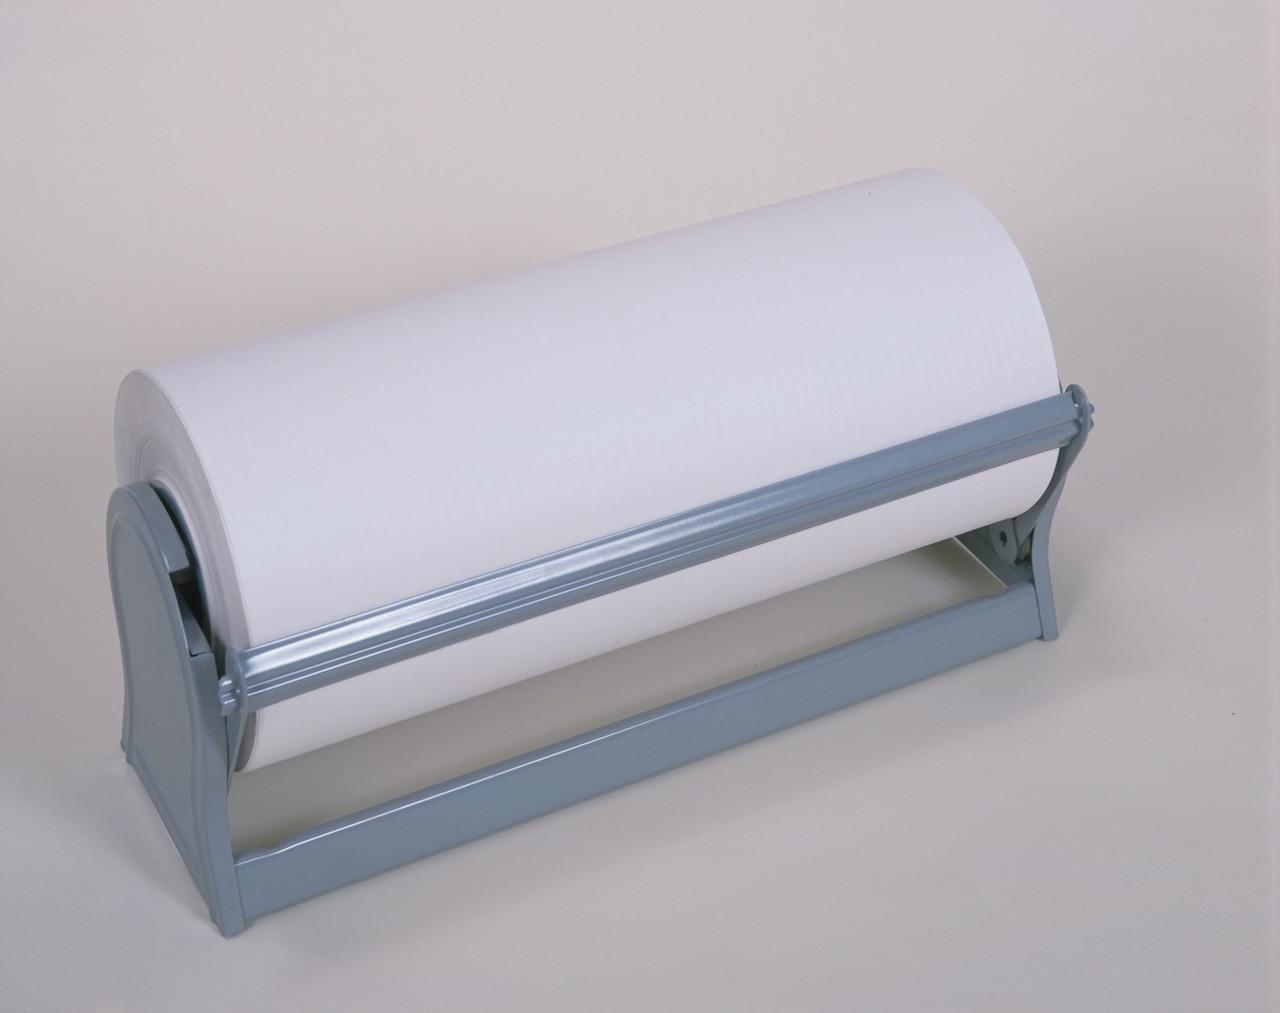 36'' Butcher Paper Cutter / Holder